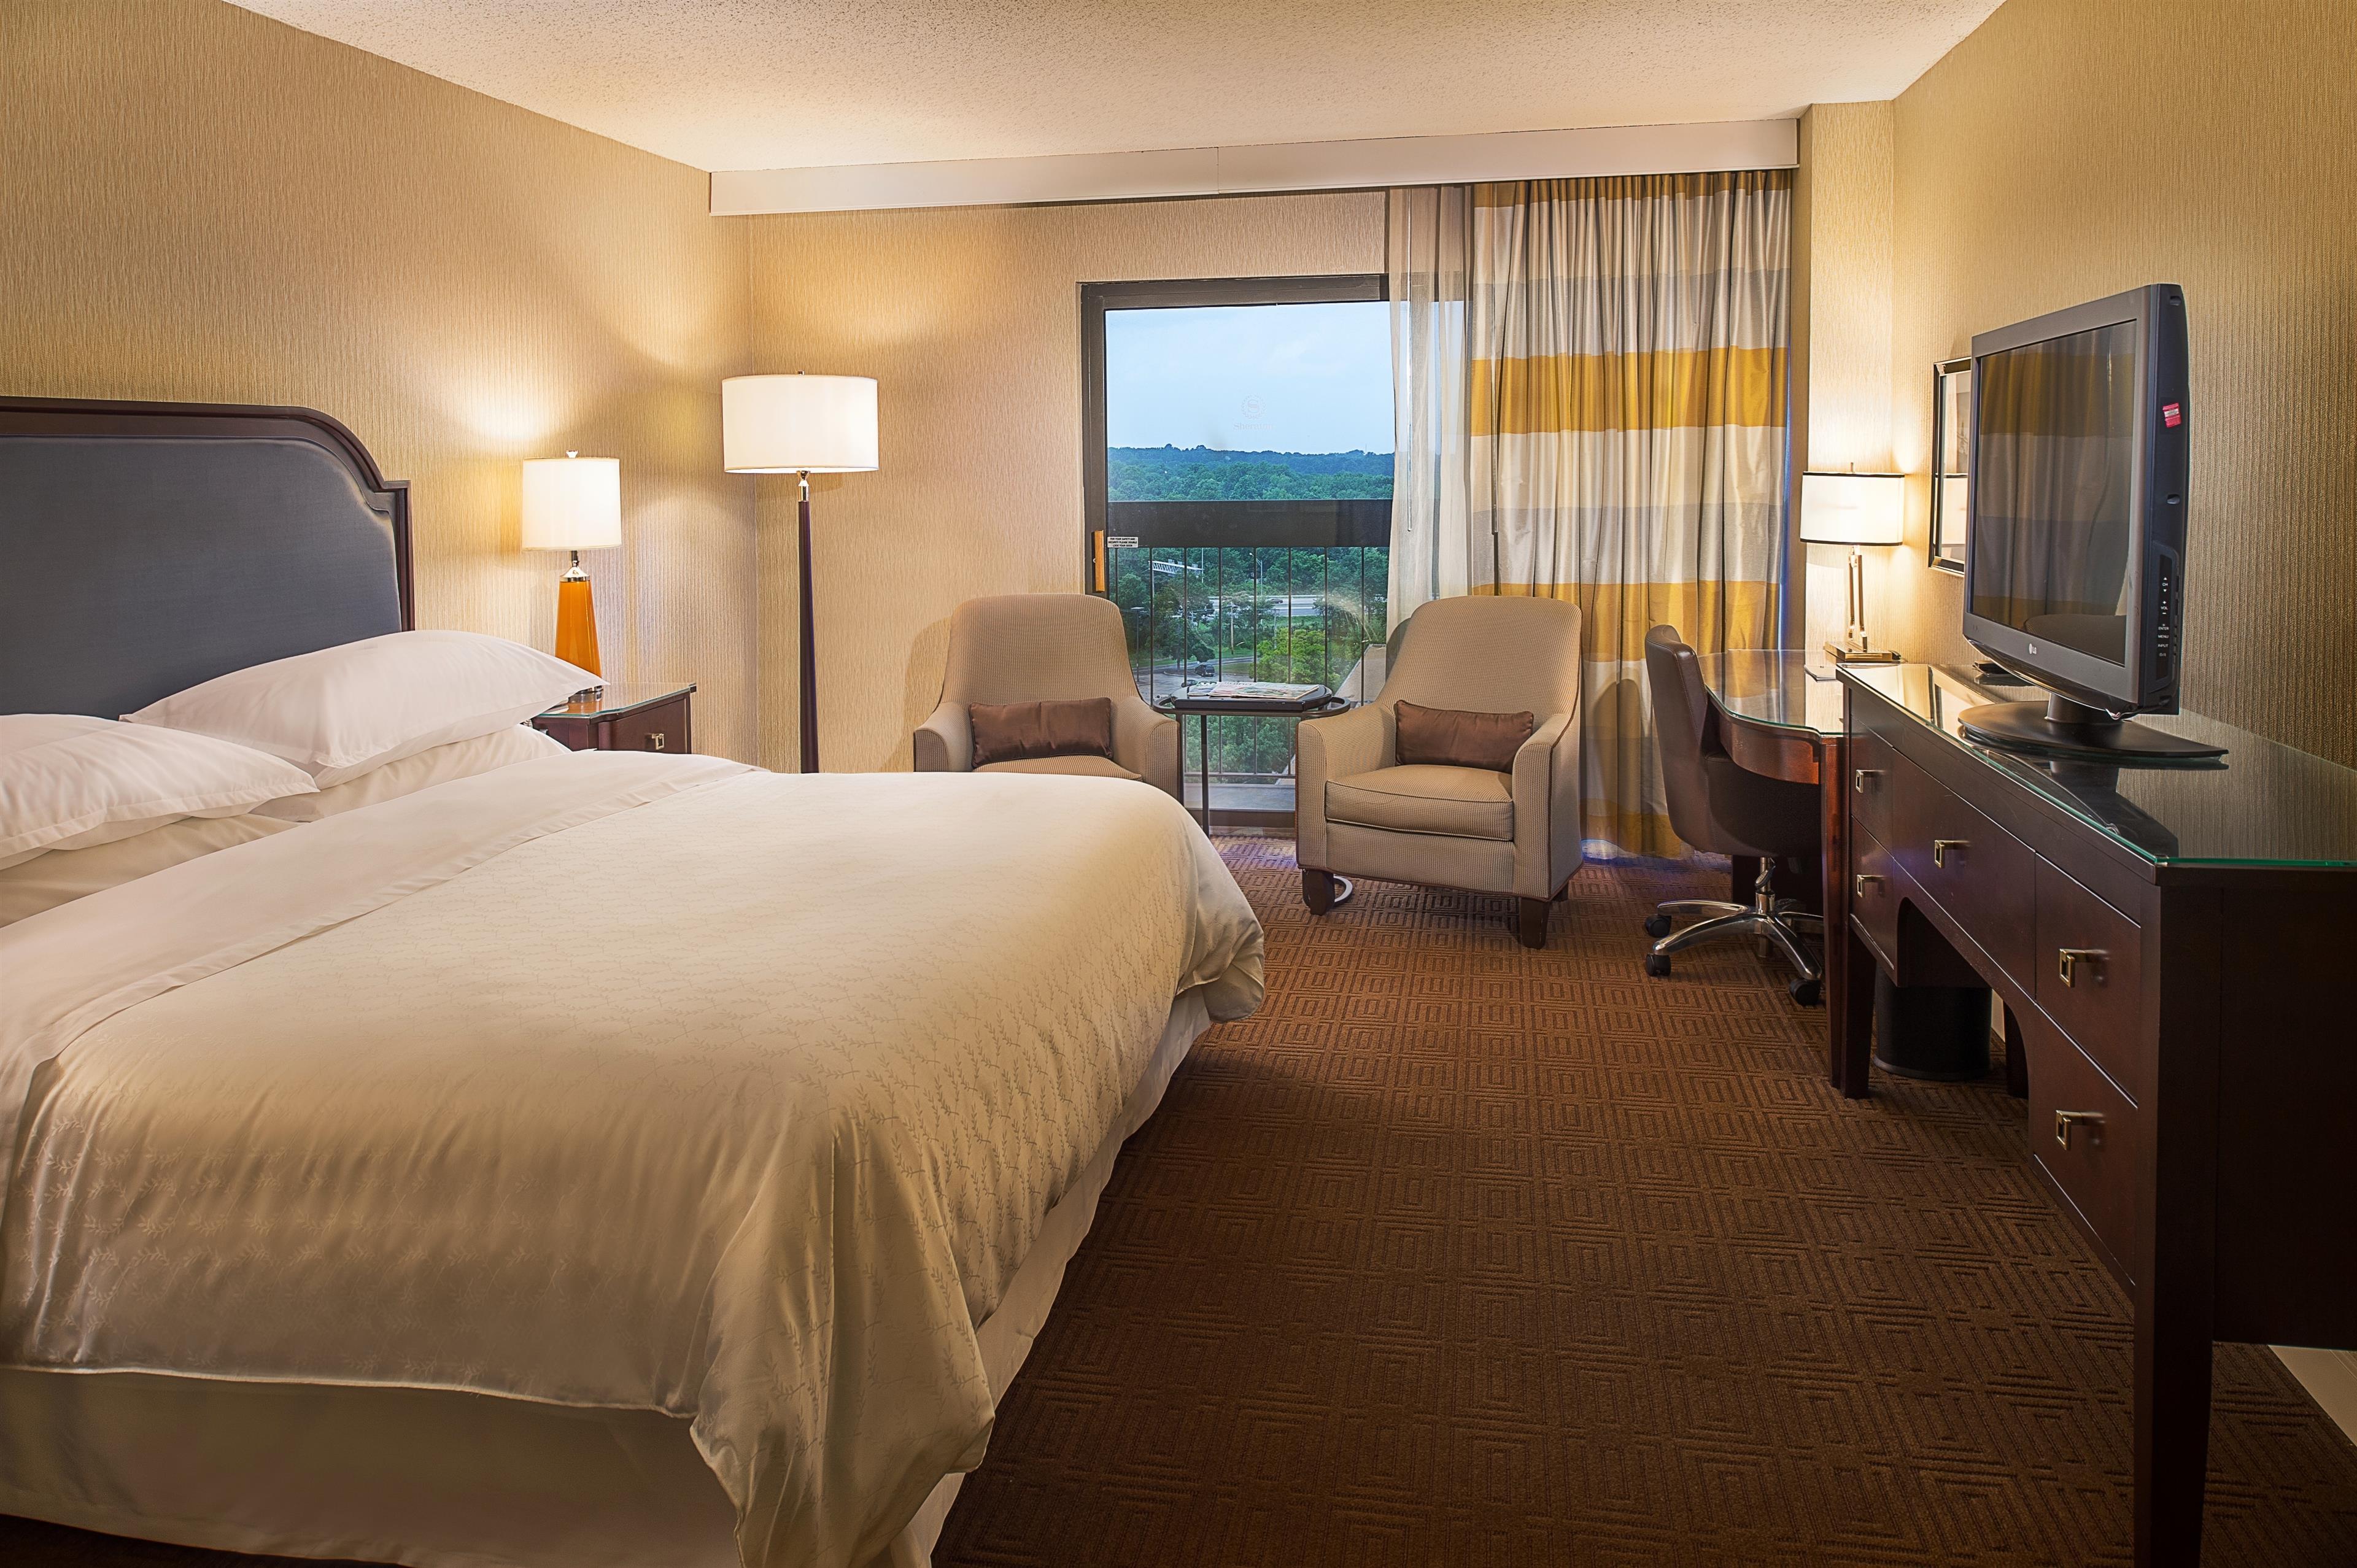 Sheraton Westport Plaza Hotel St. Louis image 29